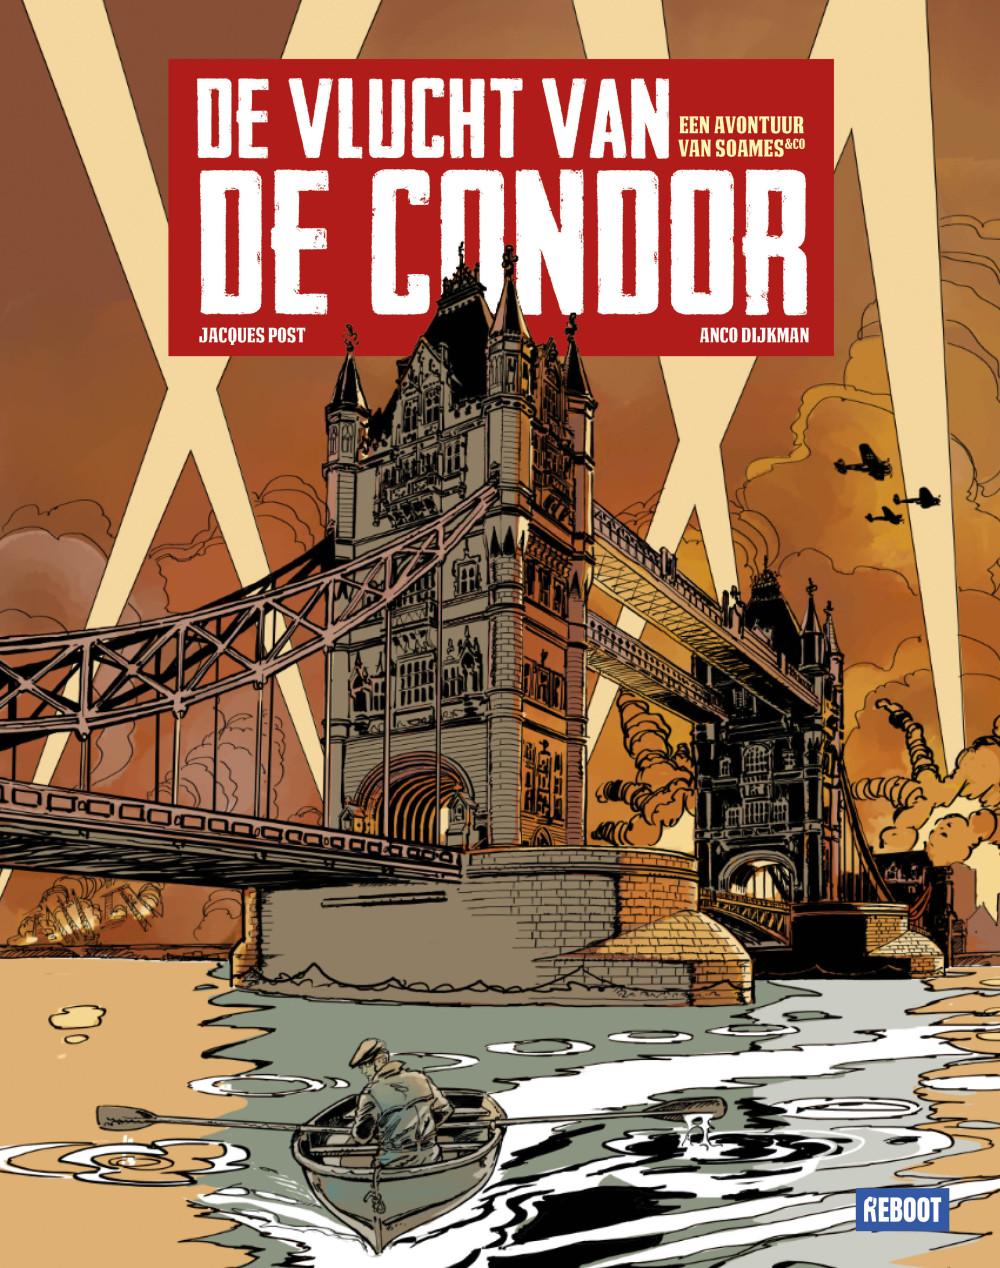 Soames & Co, De vlucht van de condor